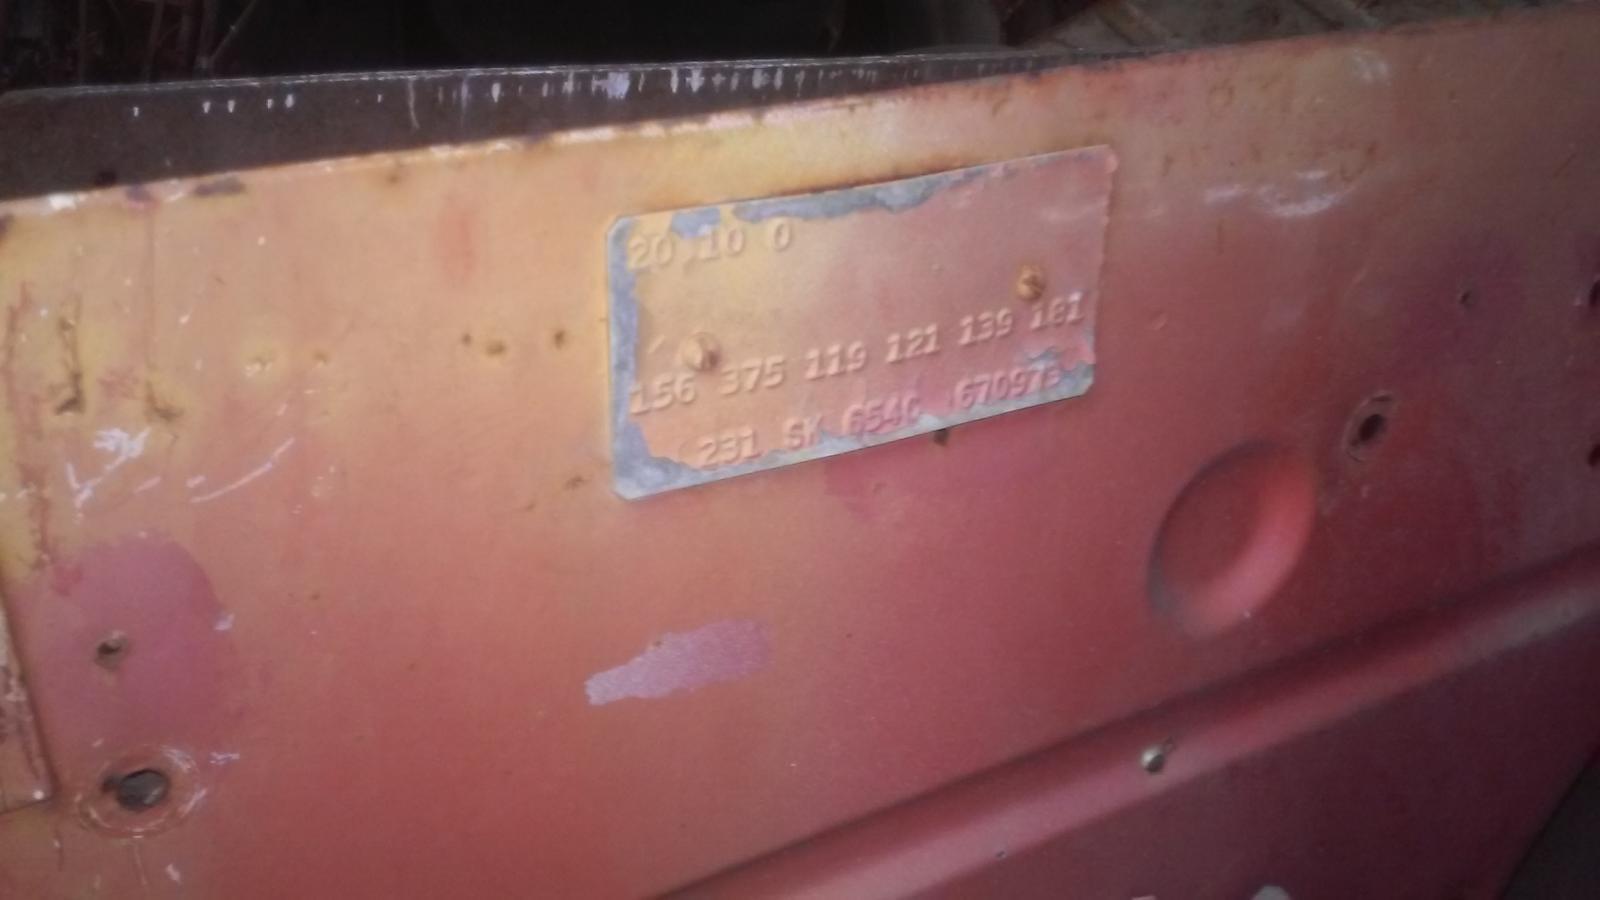 found so23 that had factory safaris, ambulance fan, gas heater.